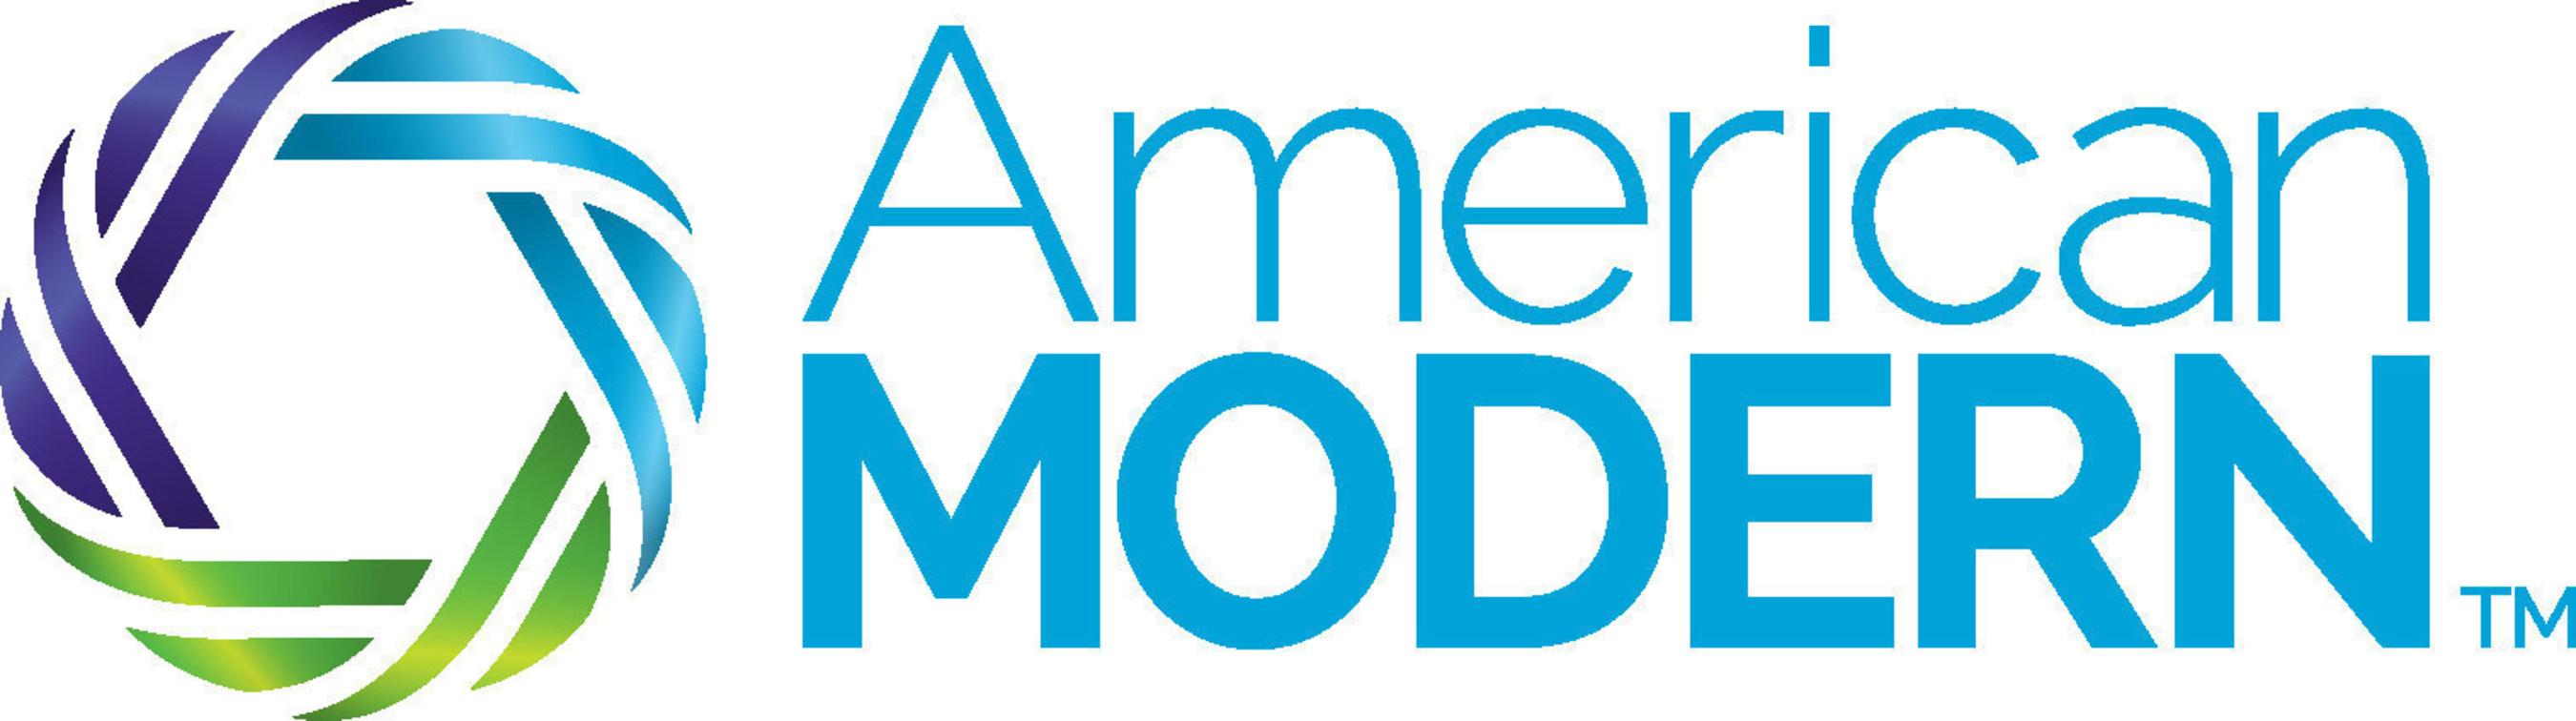 American Modern Insurance Group (R) (PRNewsFoto/American Modern Insurance Group)